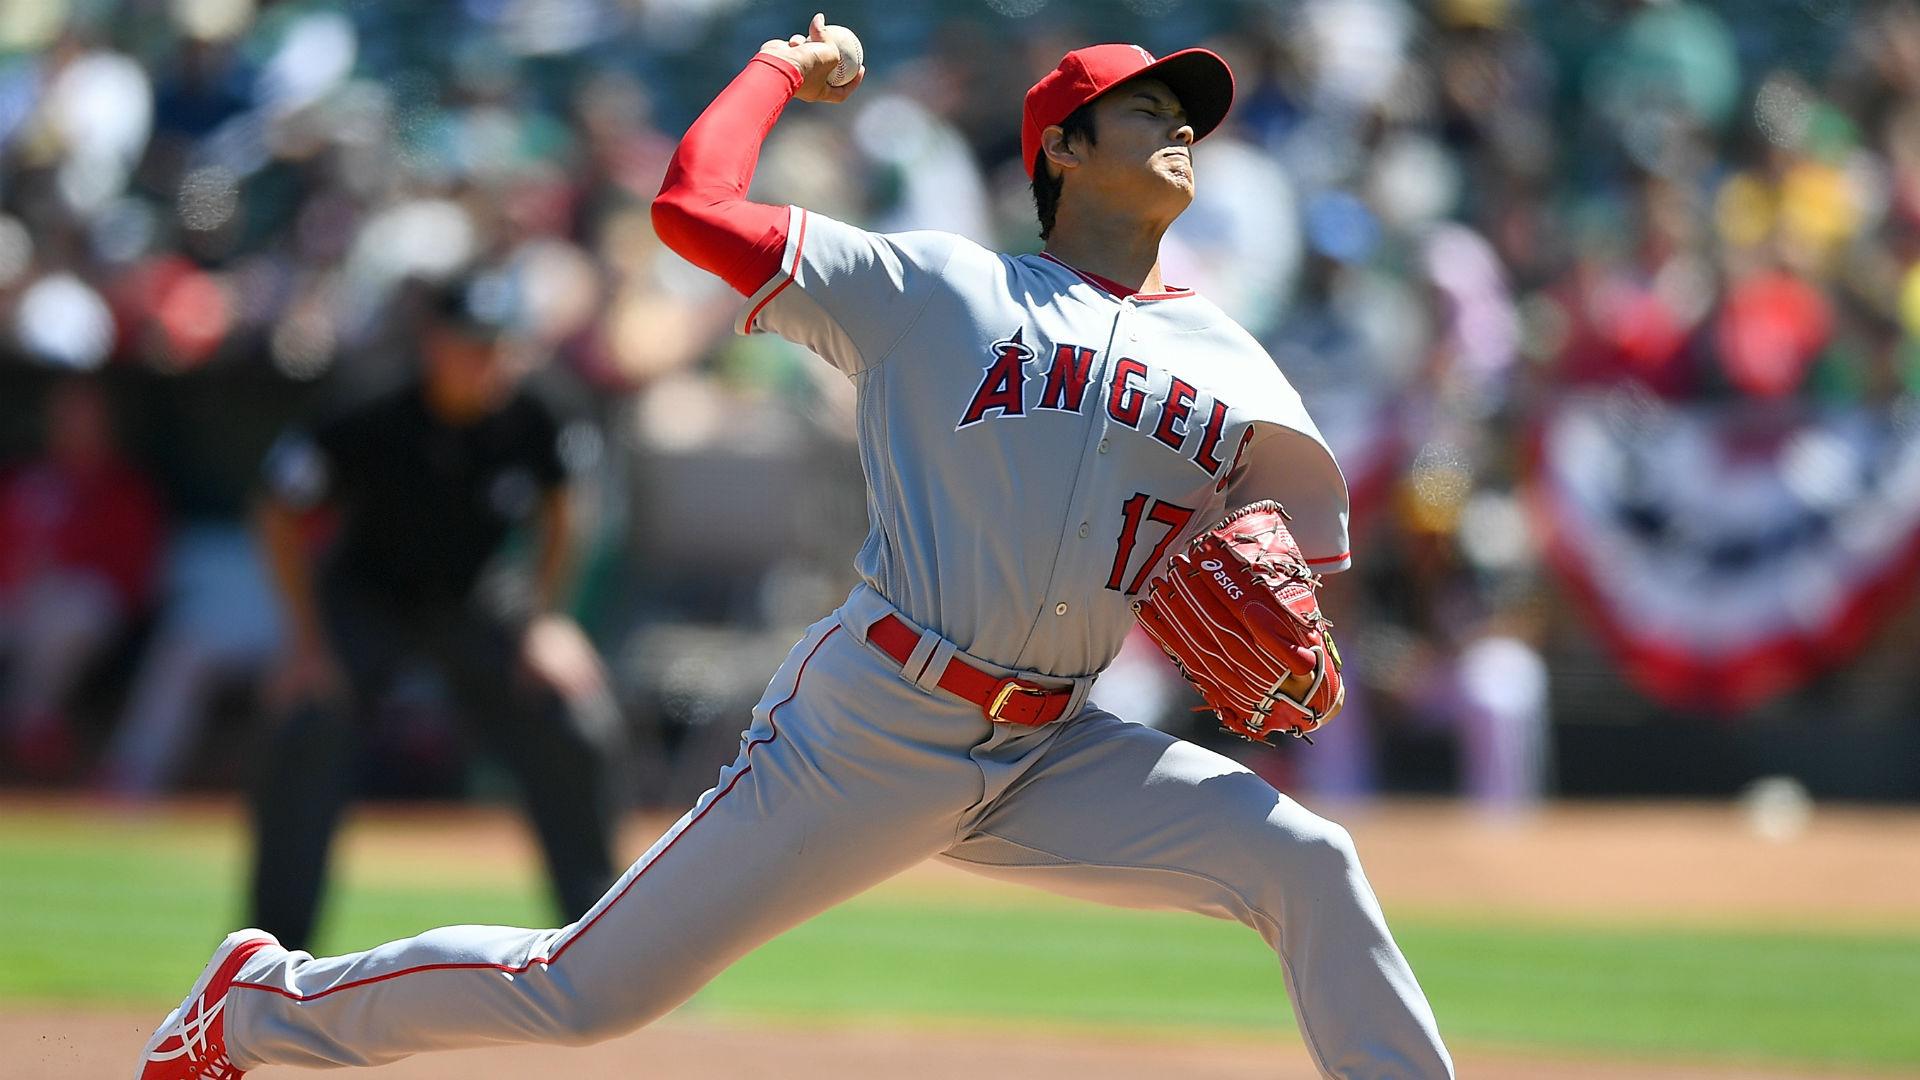 Angels' Shohei Ohtani wins major league debut against A's